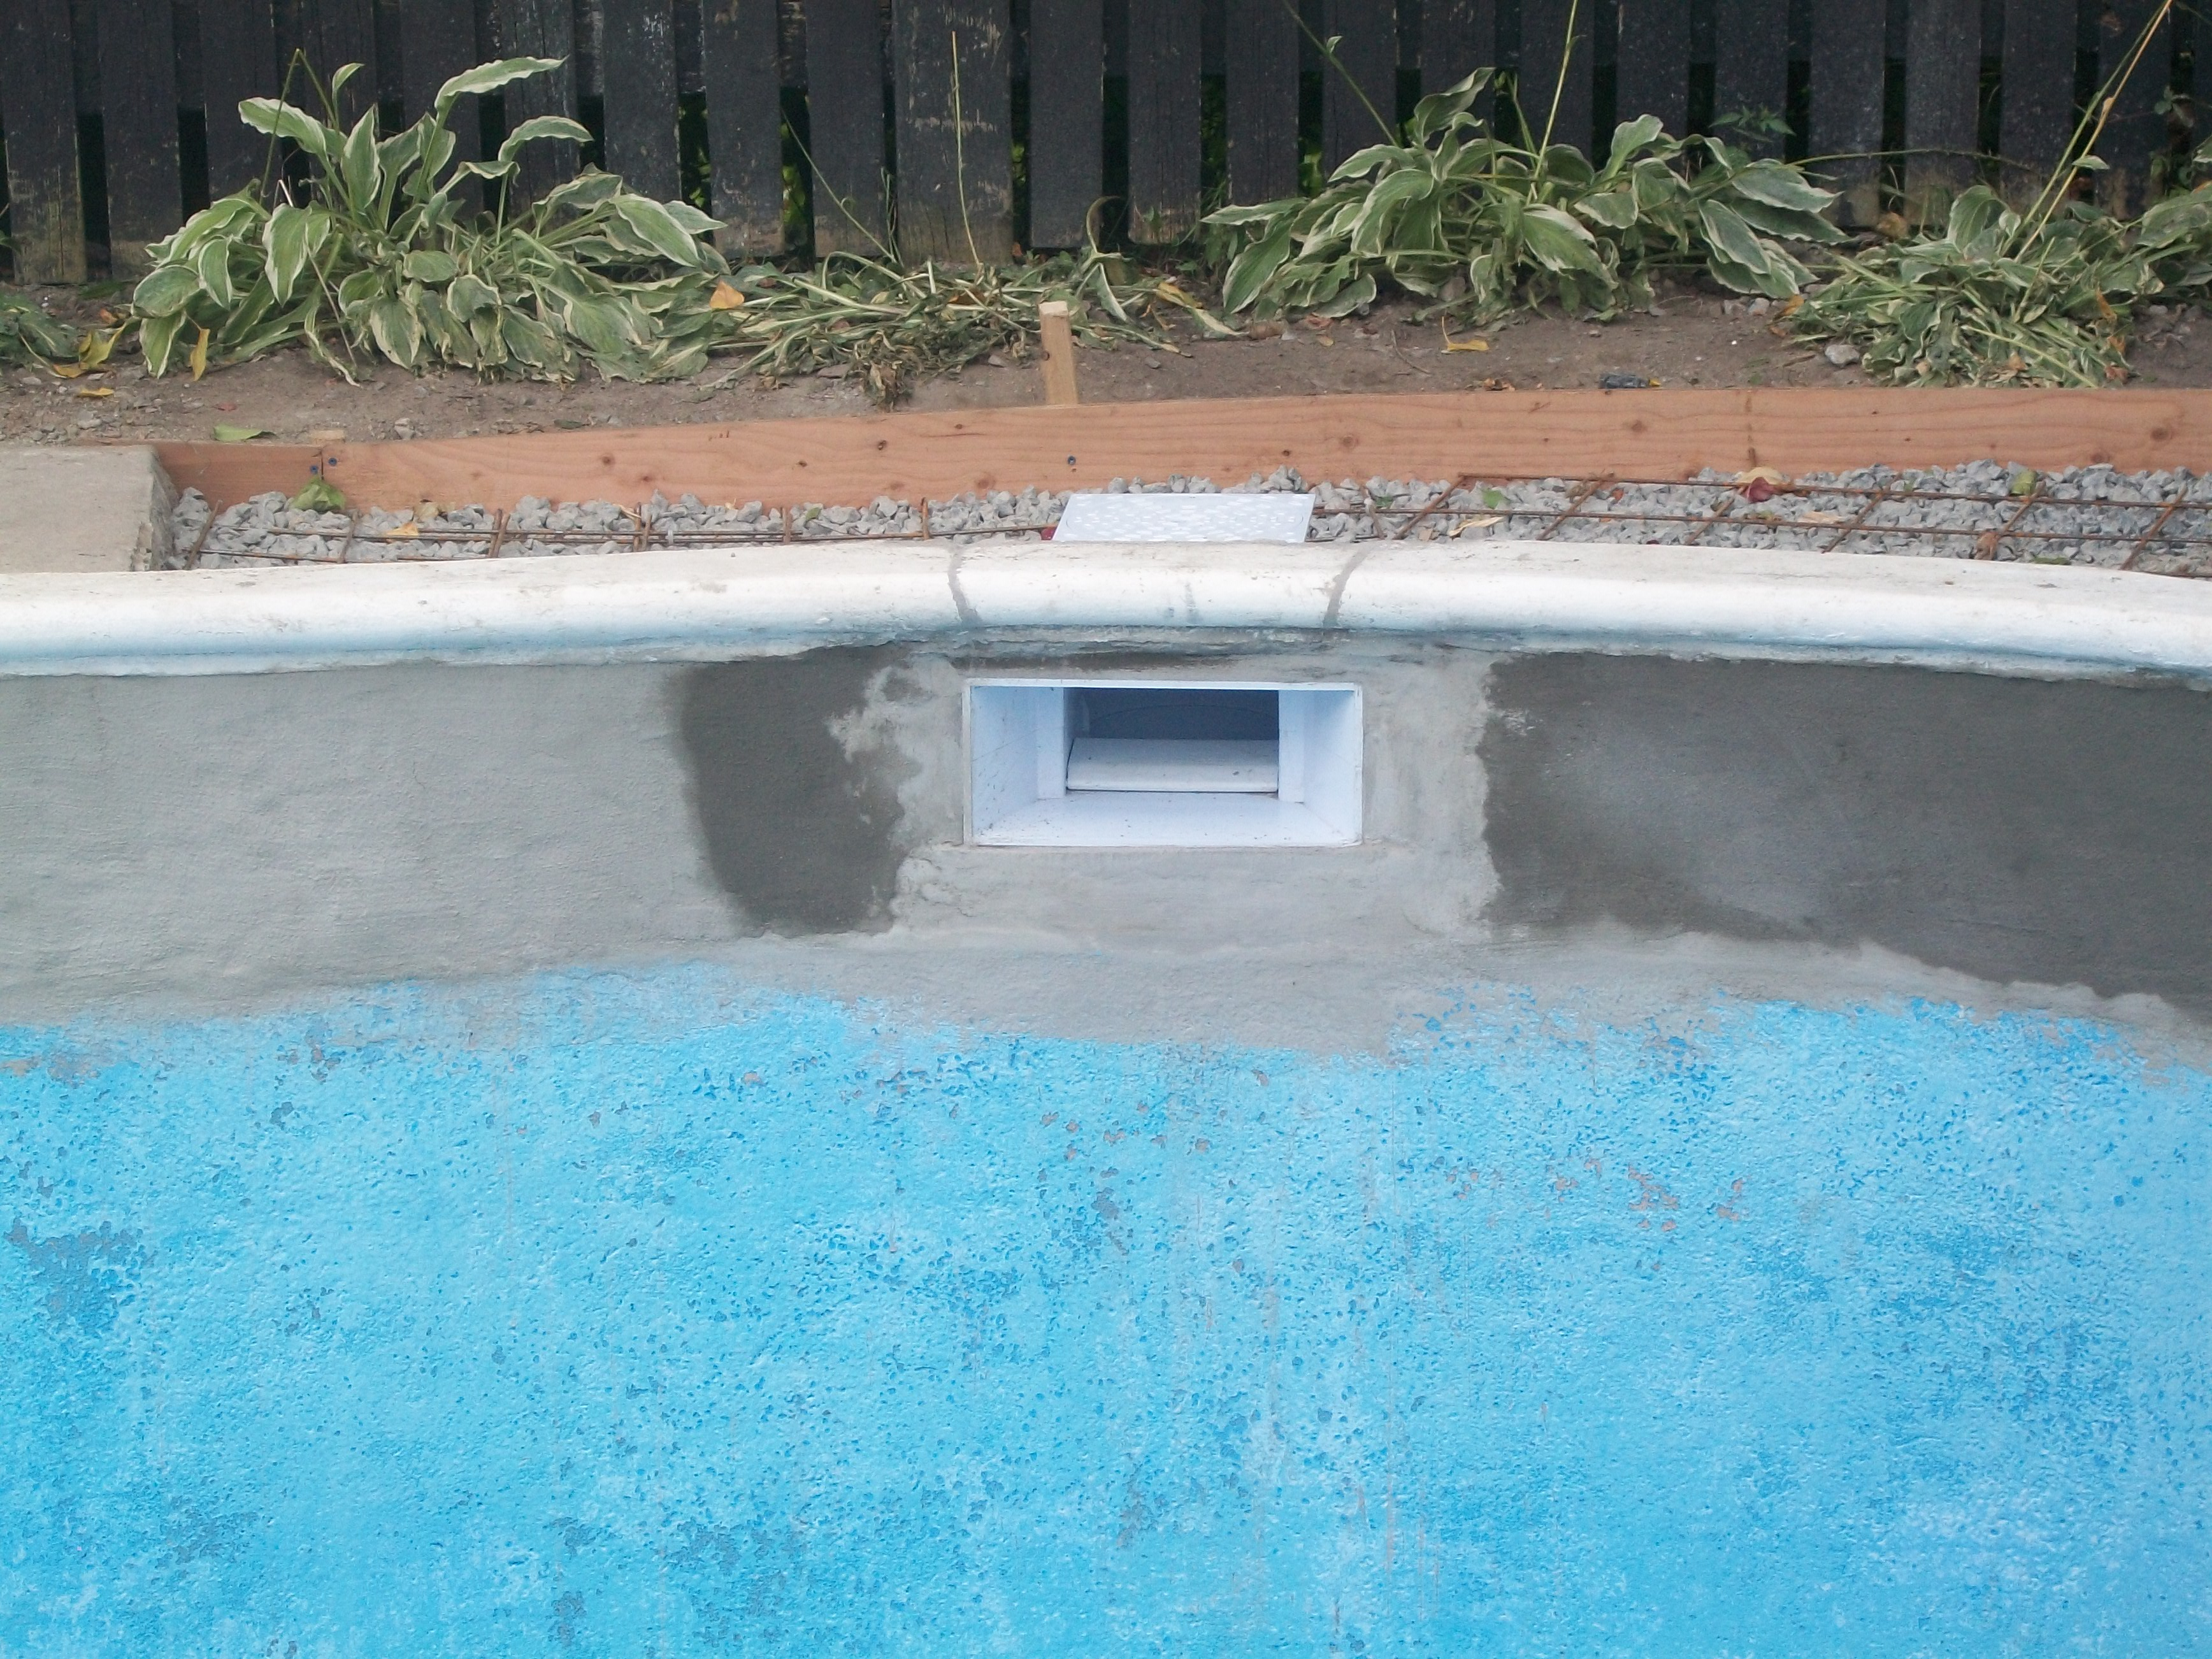 Specialiste piscine rendez vous piscinier antibes sp for Specialiste piscine